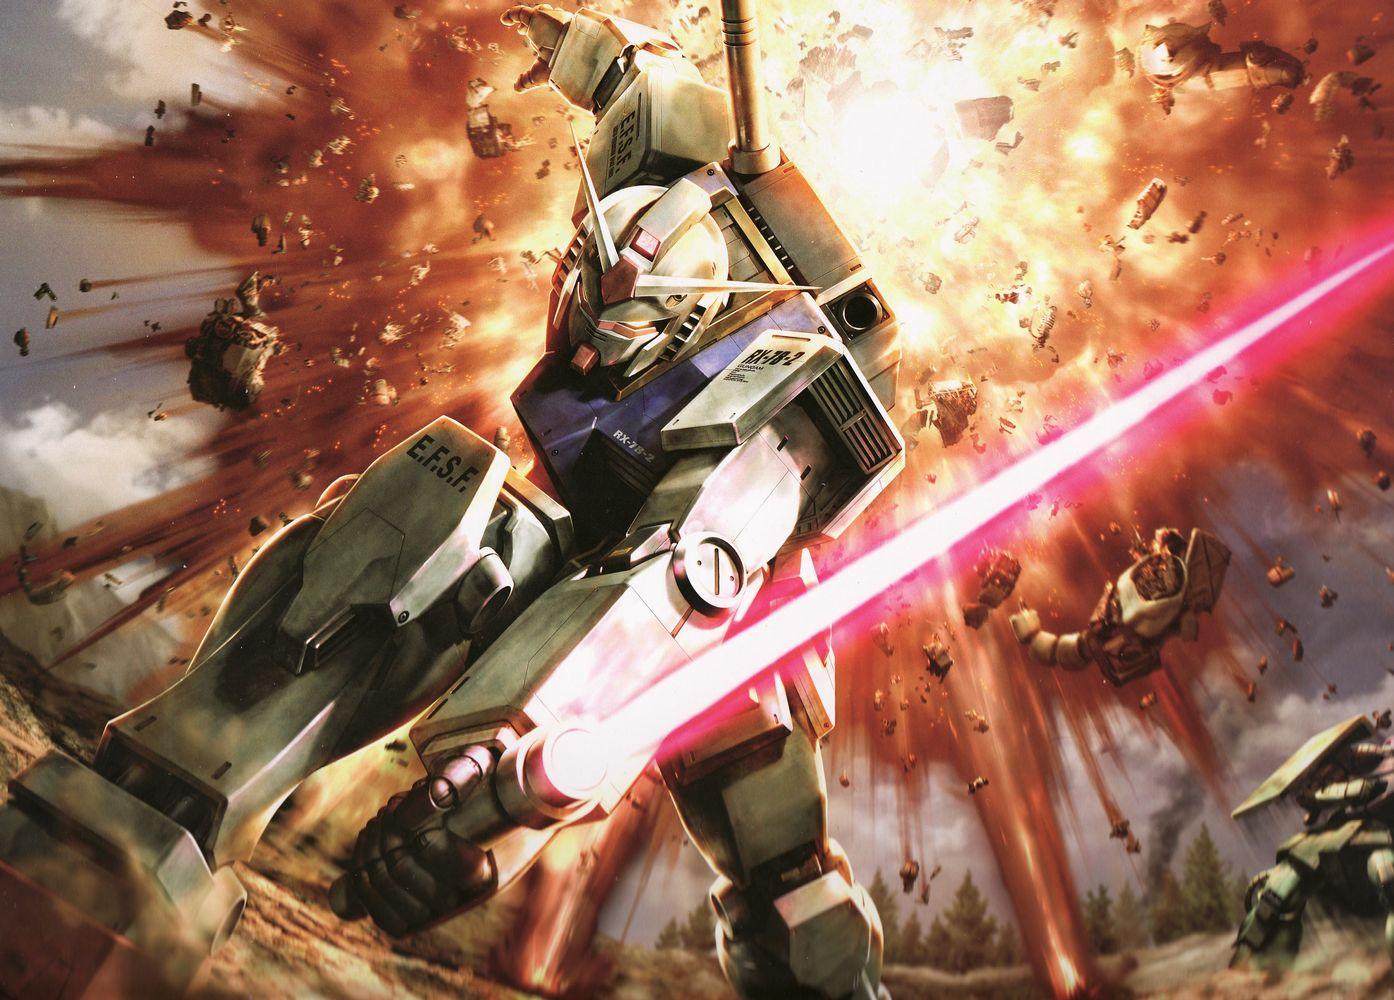 Gundam Wallpaper Iphone 5 10233 Wallpaper Game Wallpapers HD 1394x1000